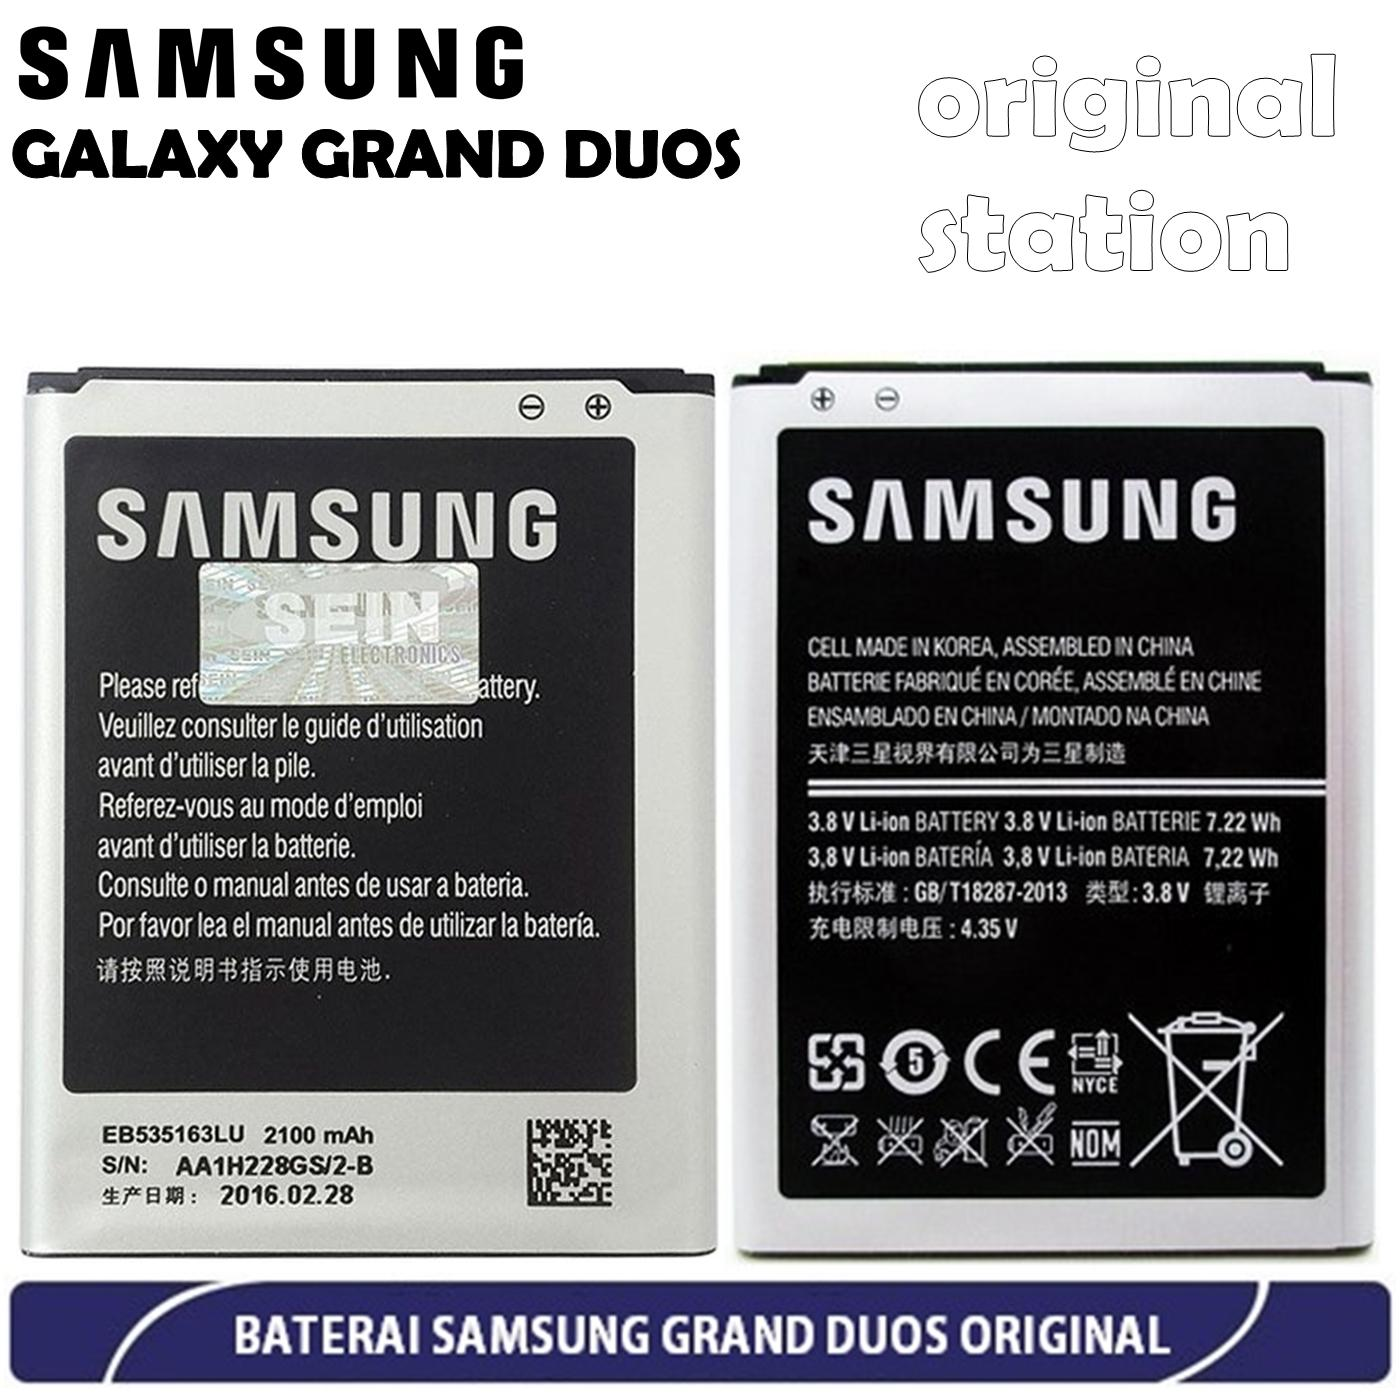 Samsung Galaxy Grand Duos I9082 Baterai Kapasitas 2100 mAh - Original | Lazada Indonesia